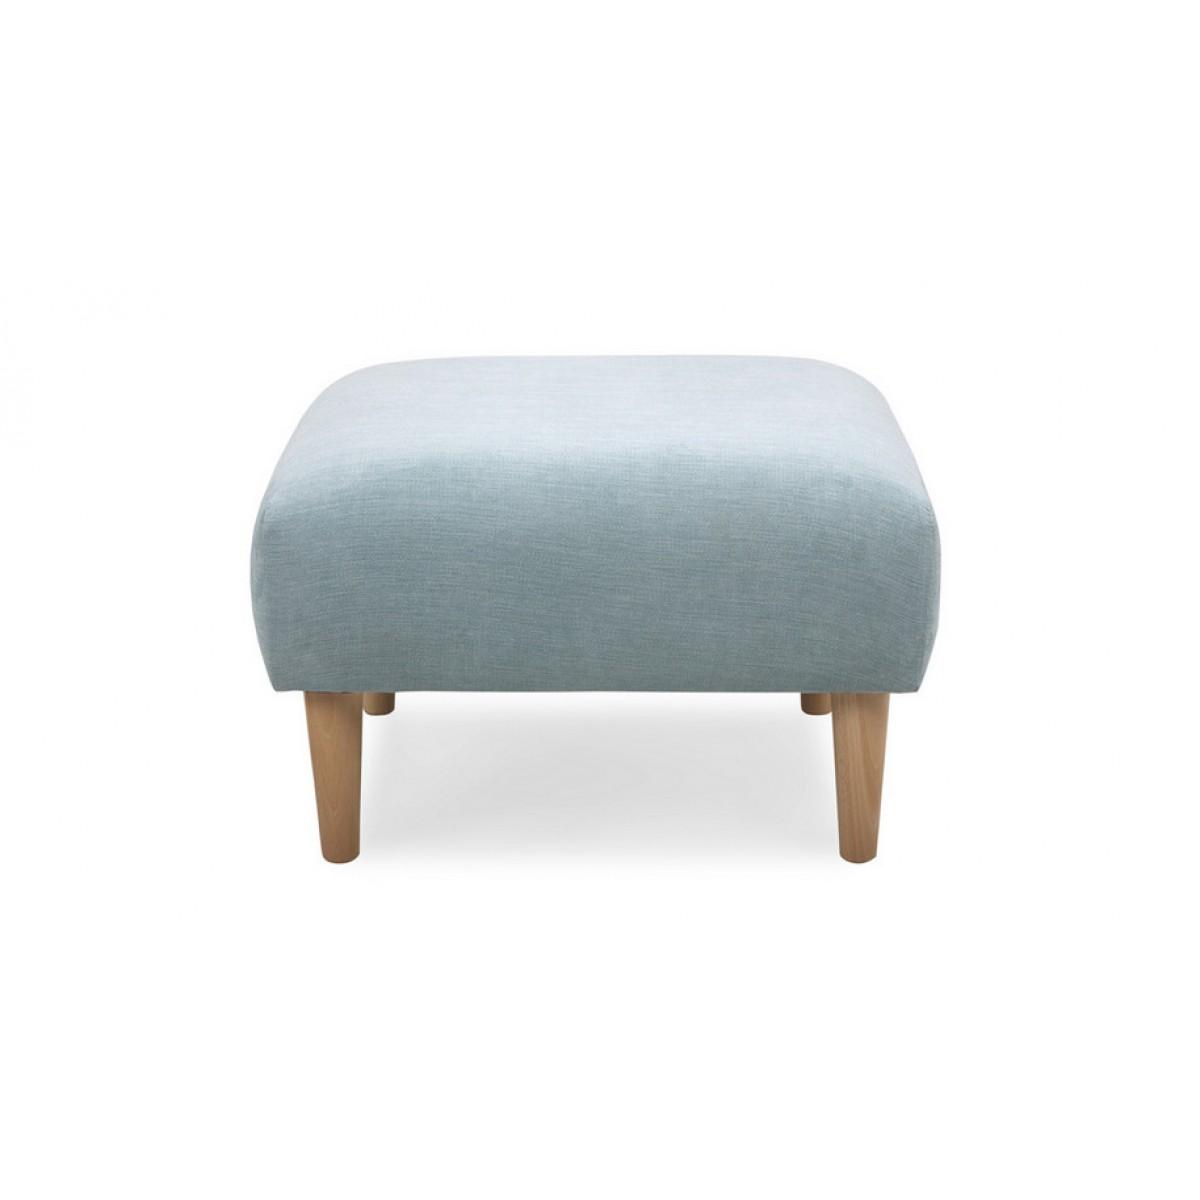 Grand canap d 39 angle personnalisable calais lin ou - Grand canape d angle tissu ...